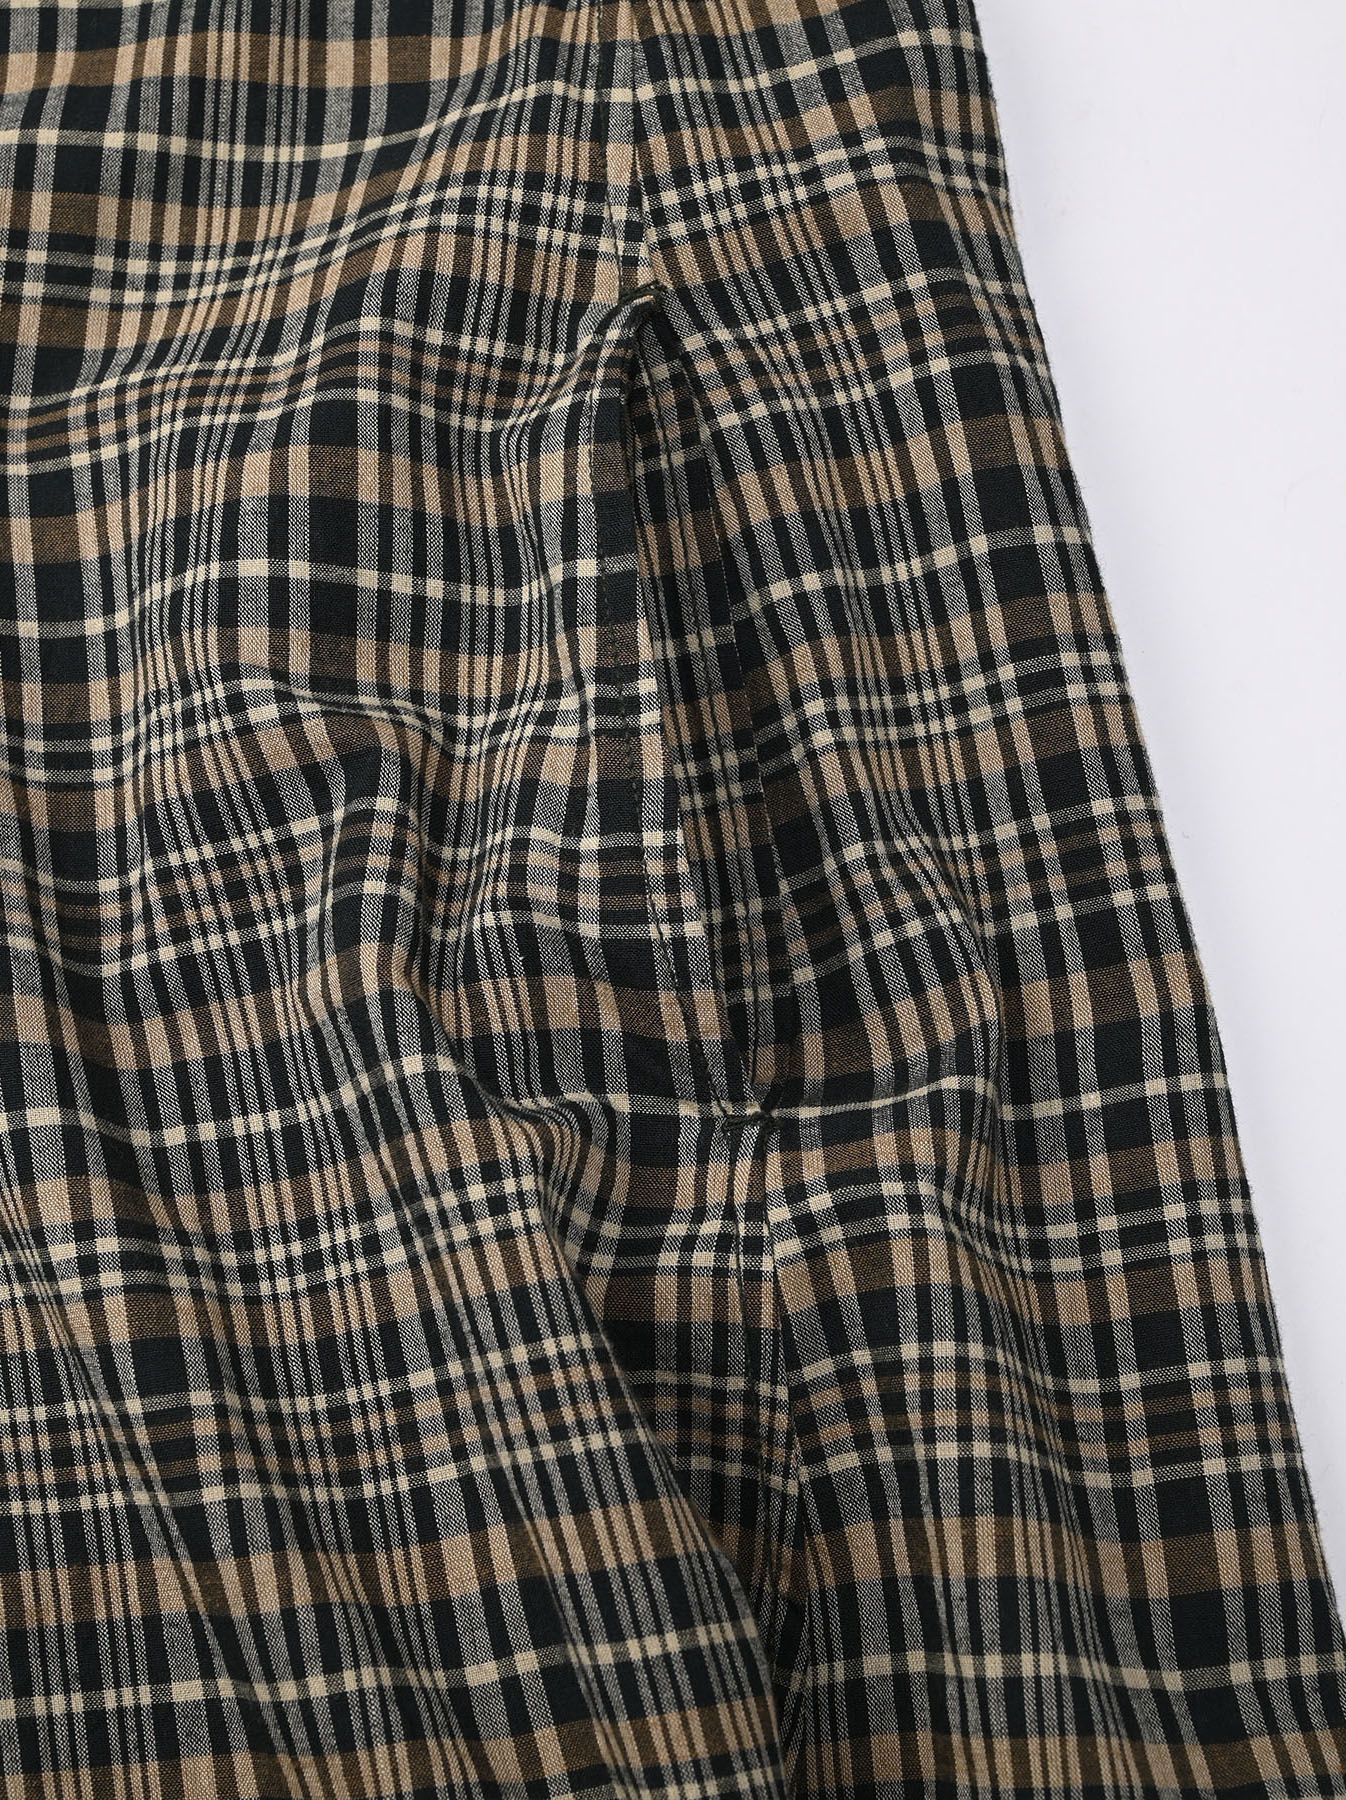 Indian Mugi-hira Dress (0421)-9